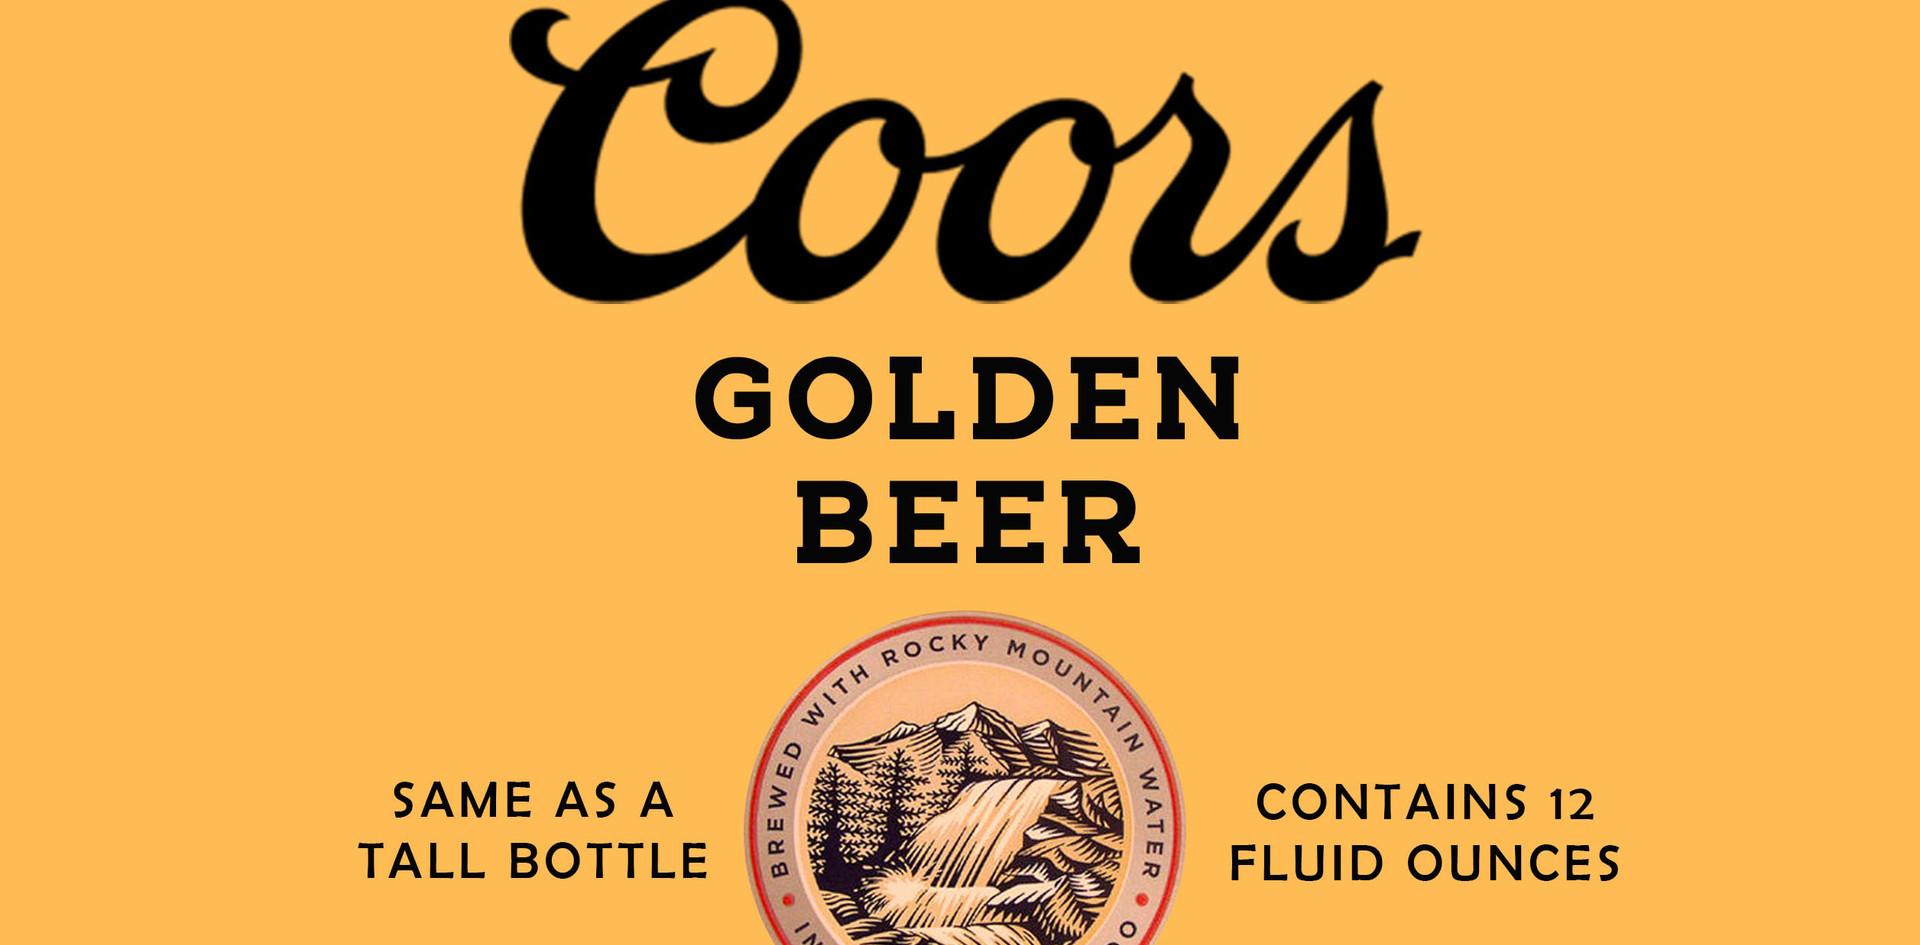 Coors beer bottle label #4